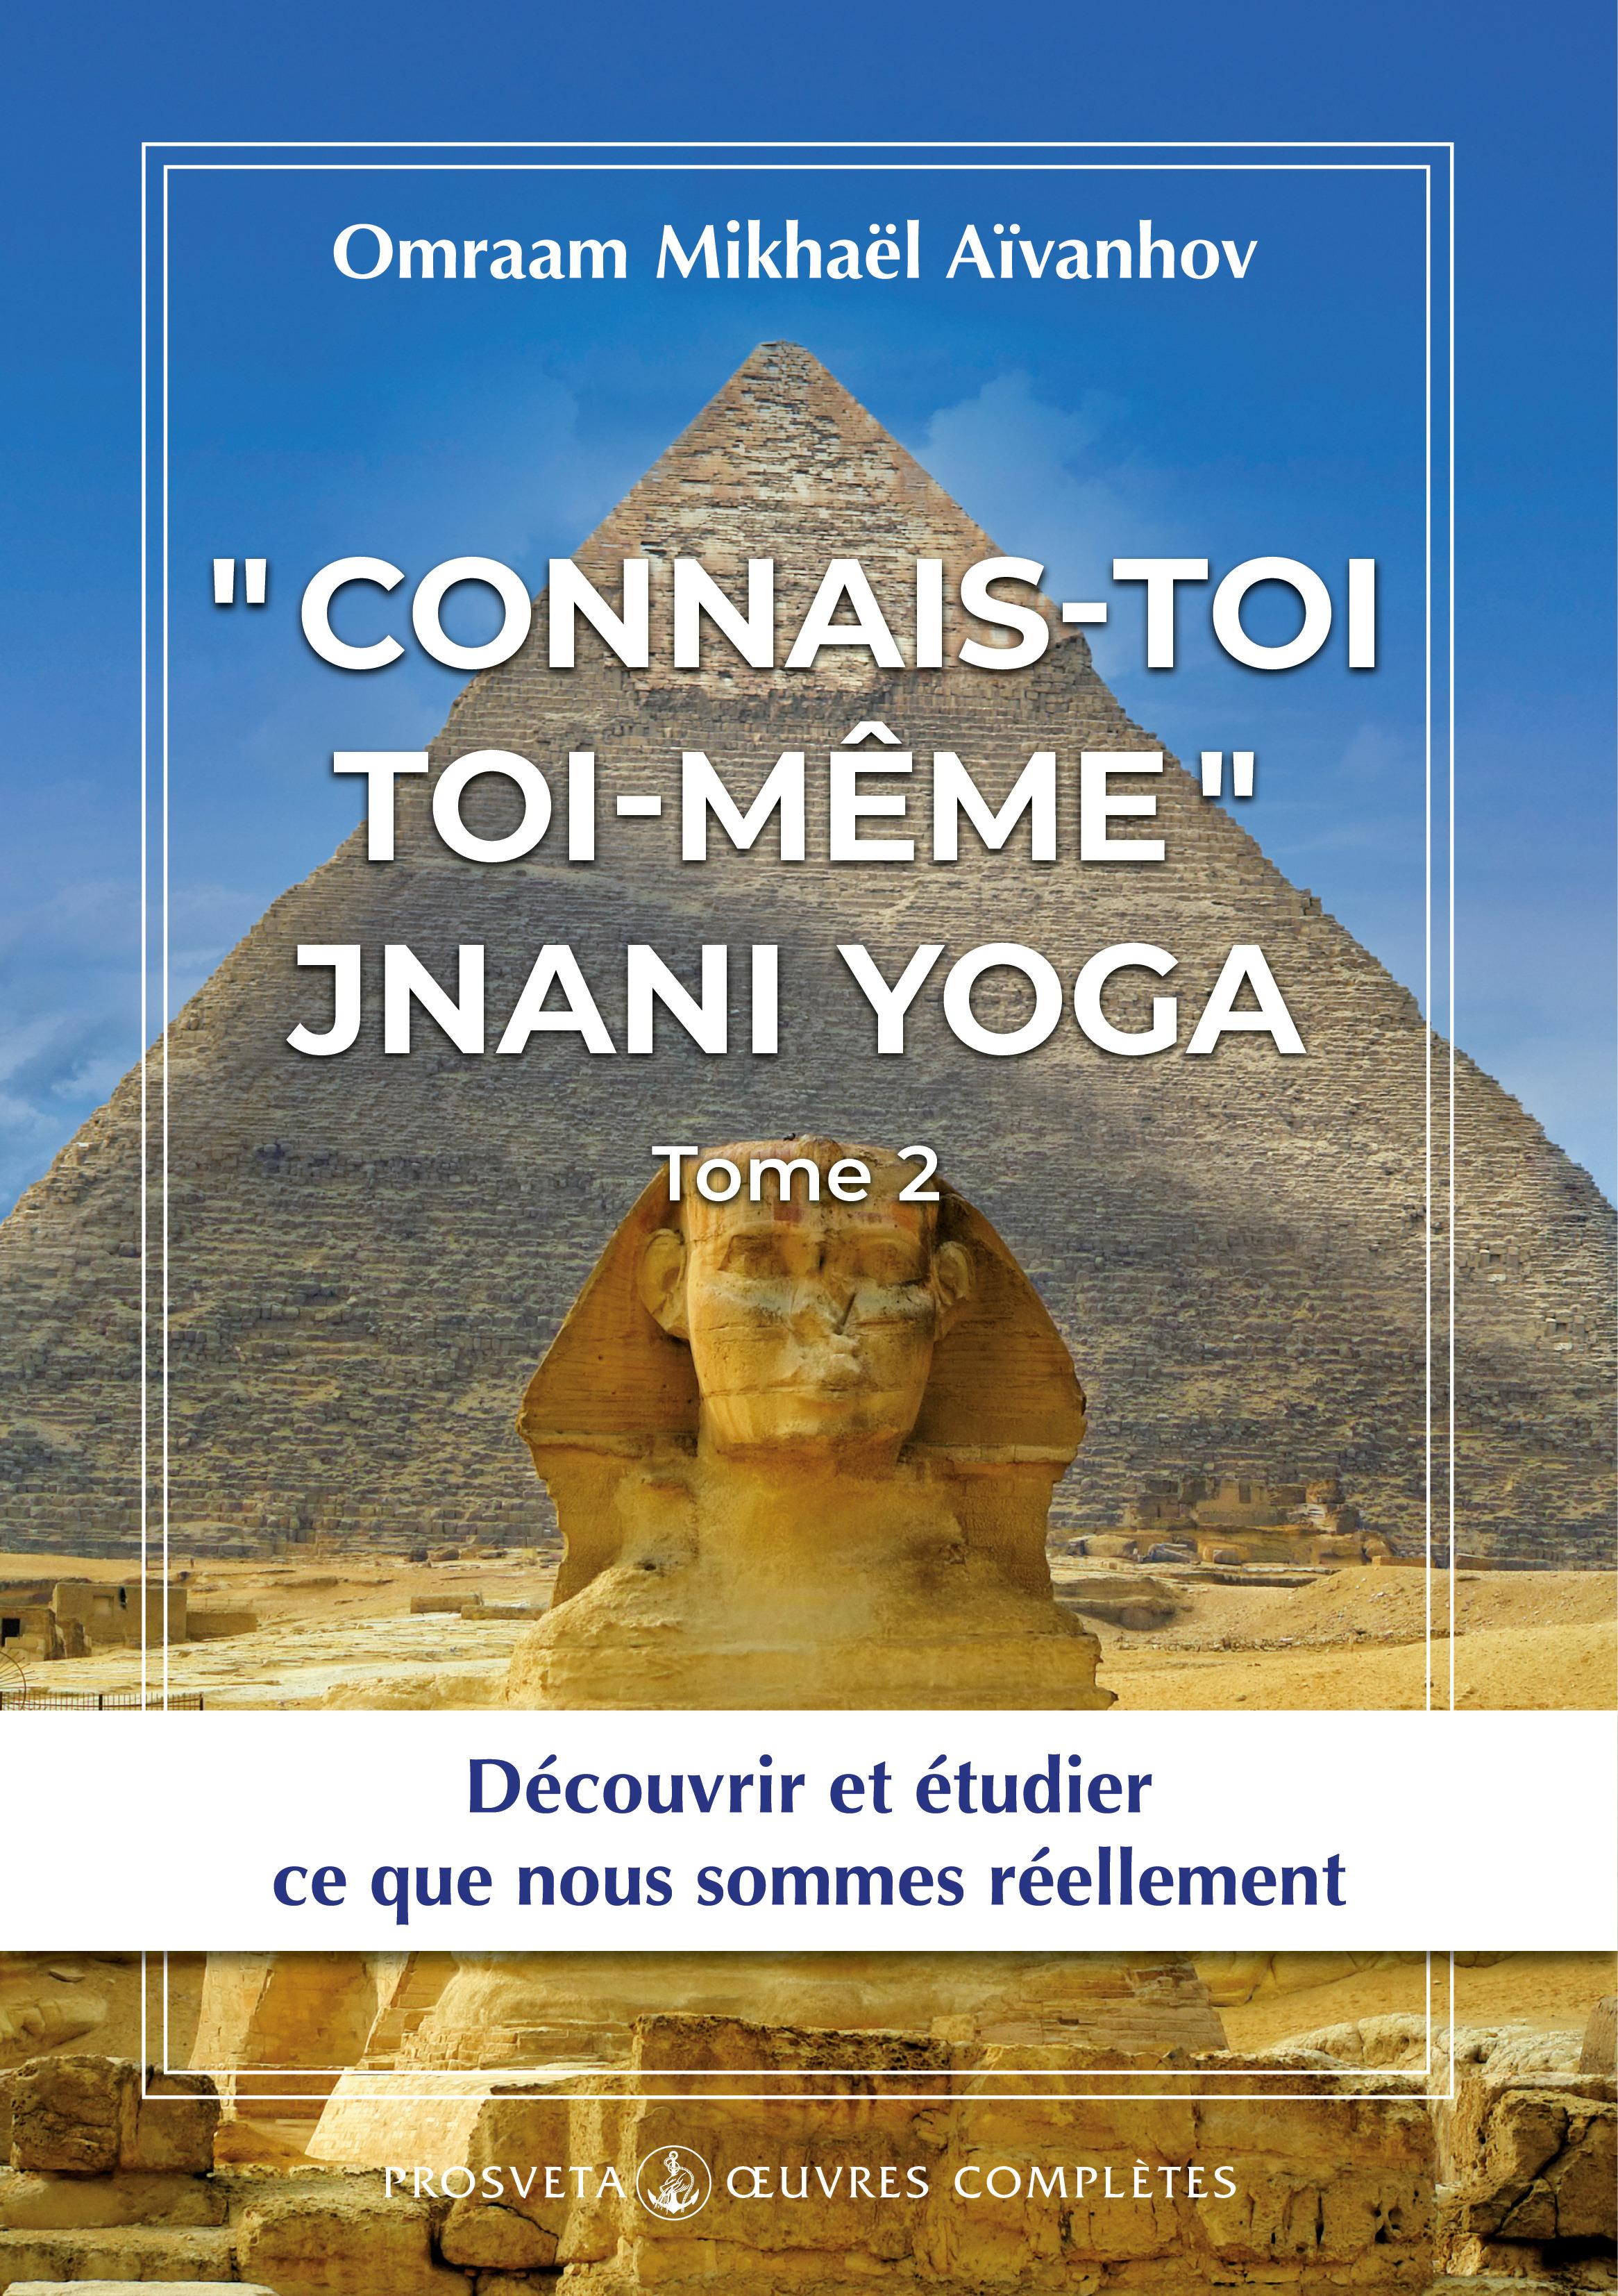 OEUVRES COMPLETES T.18 ; « connais-toi toi-même » t.2 ; Jnani yoga